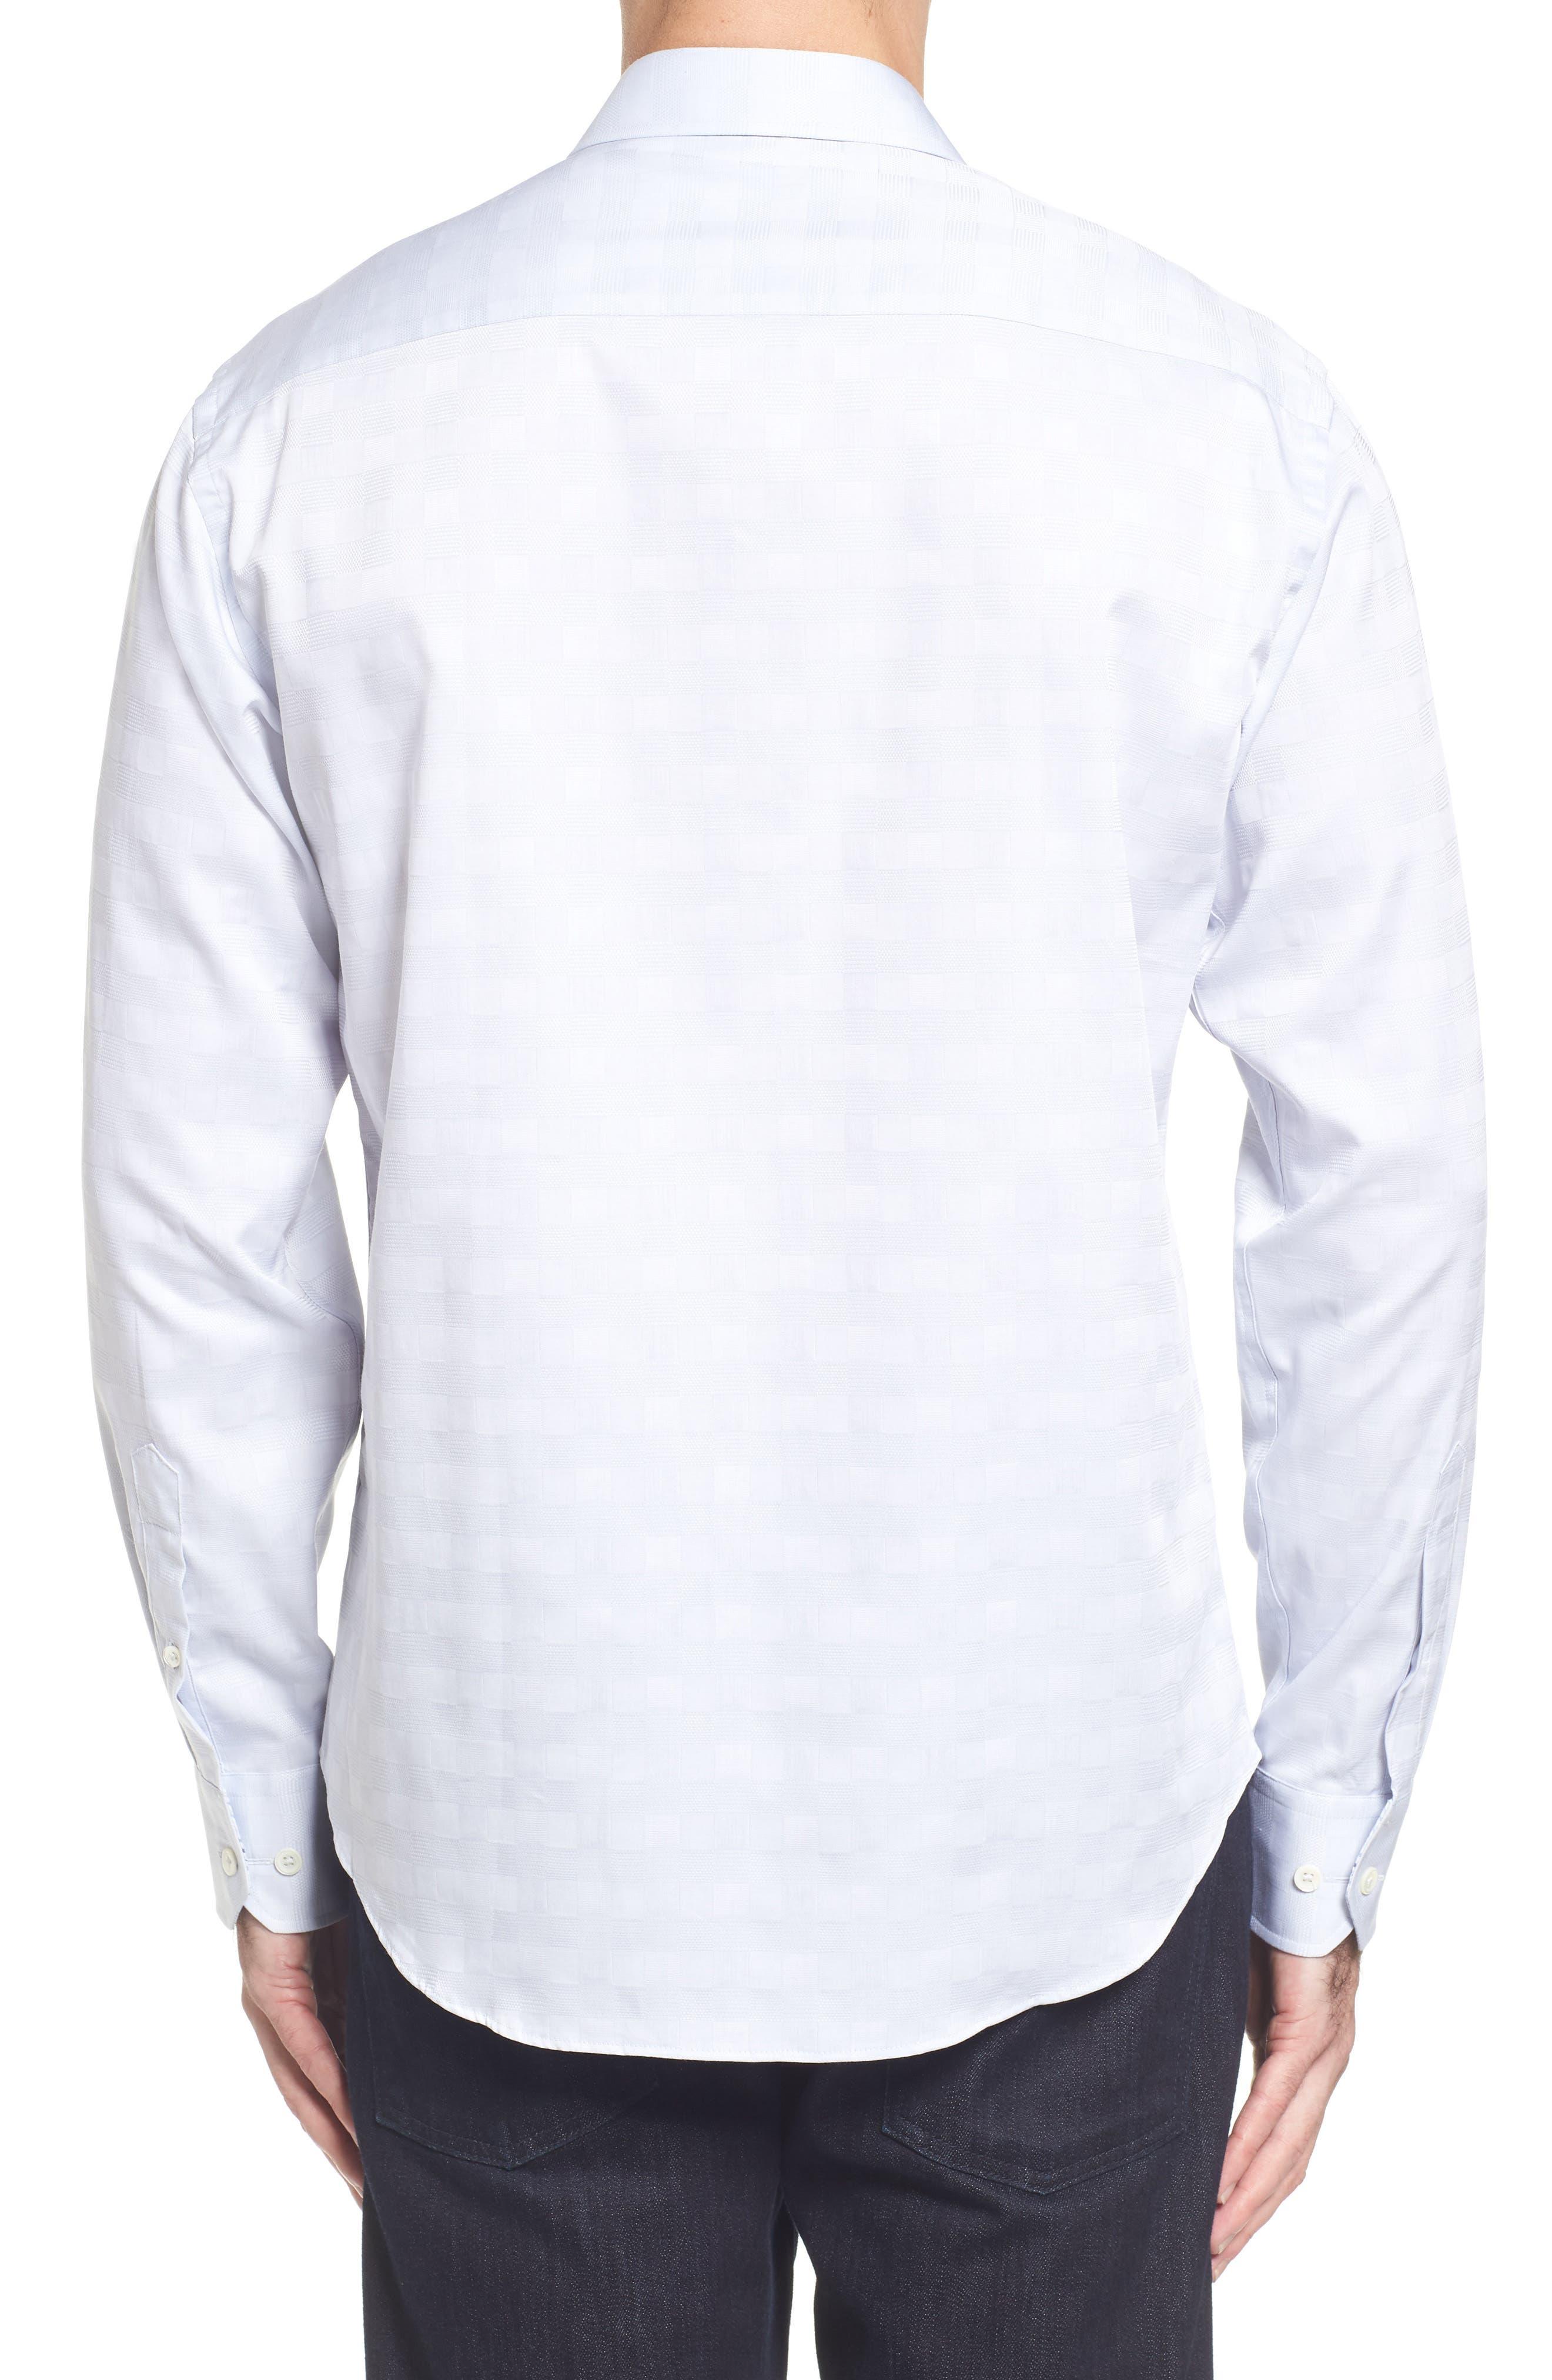 BUGATCHI,                             Classic Fit Check Jacquard Sport Shirt,                             Alternate thumbnail 2, color,                             040